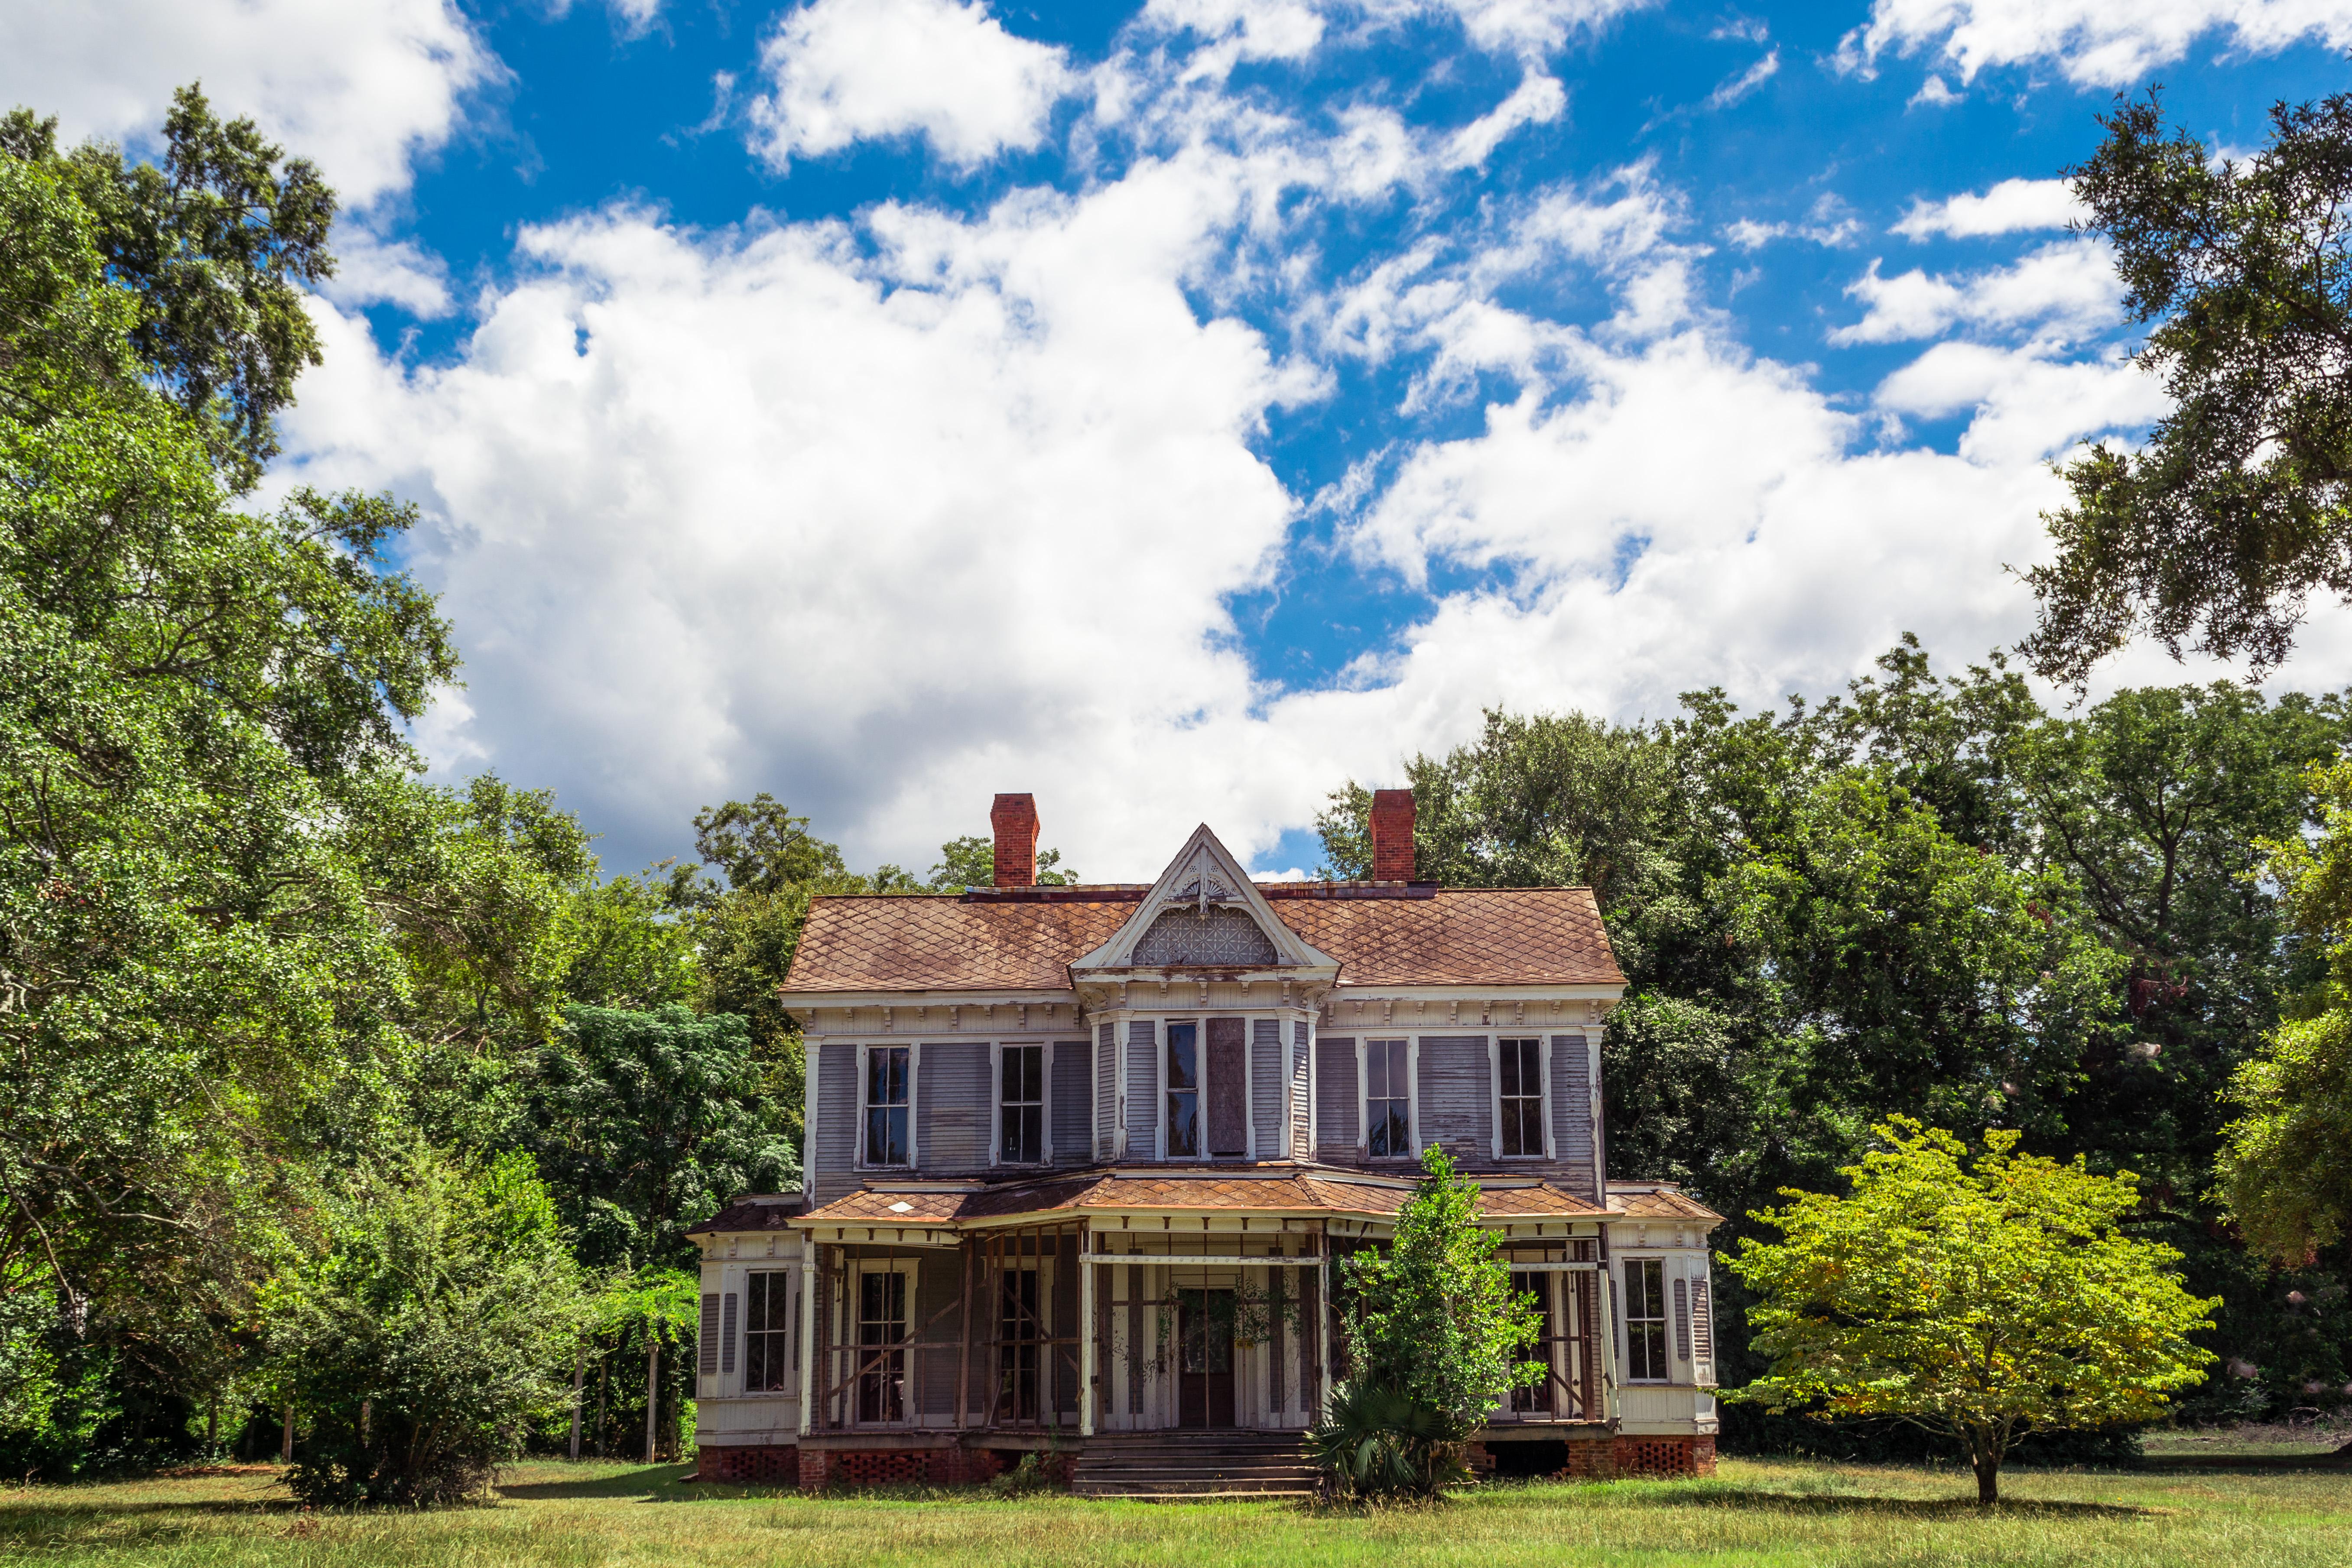 Dilapidated Victorian